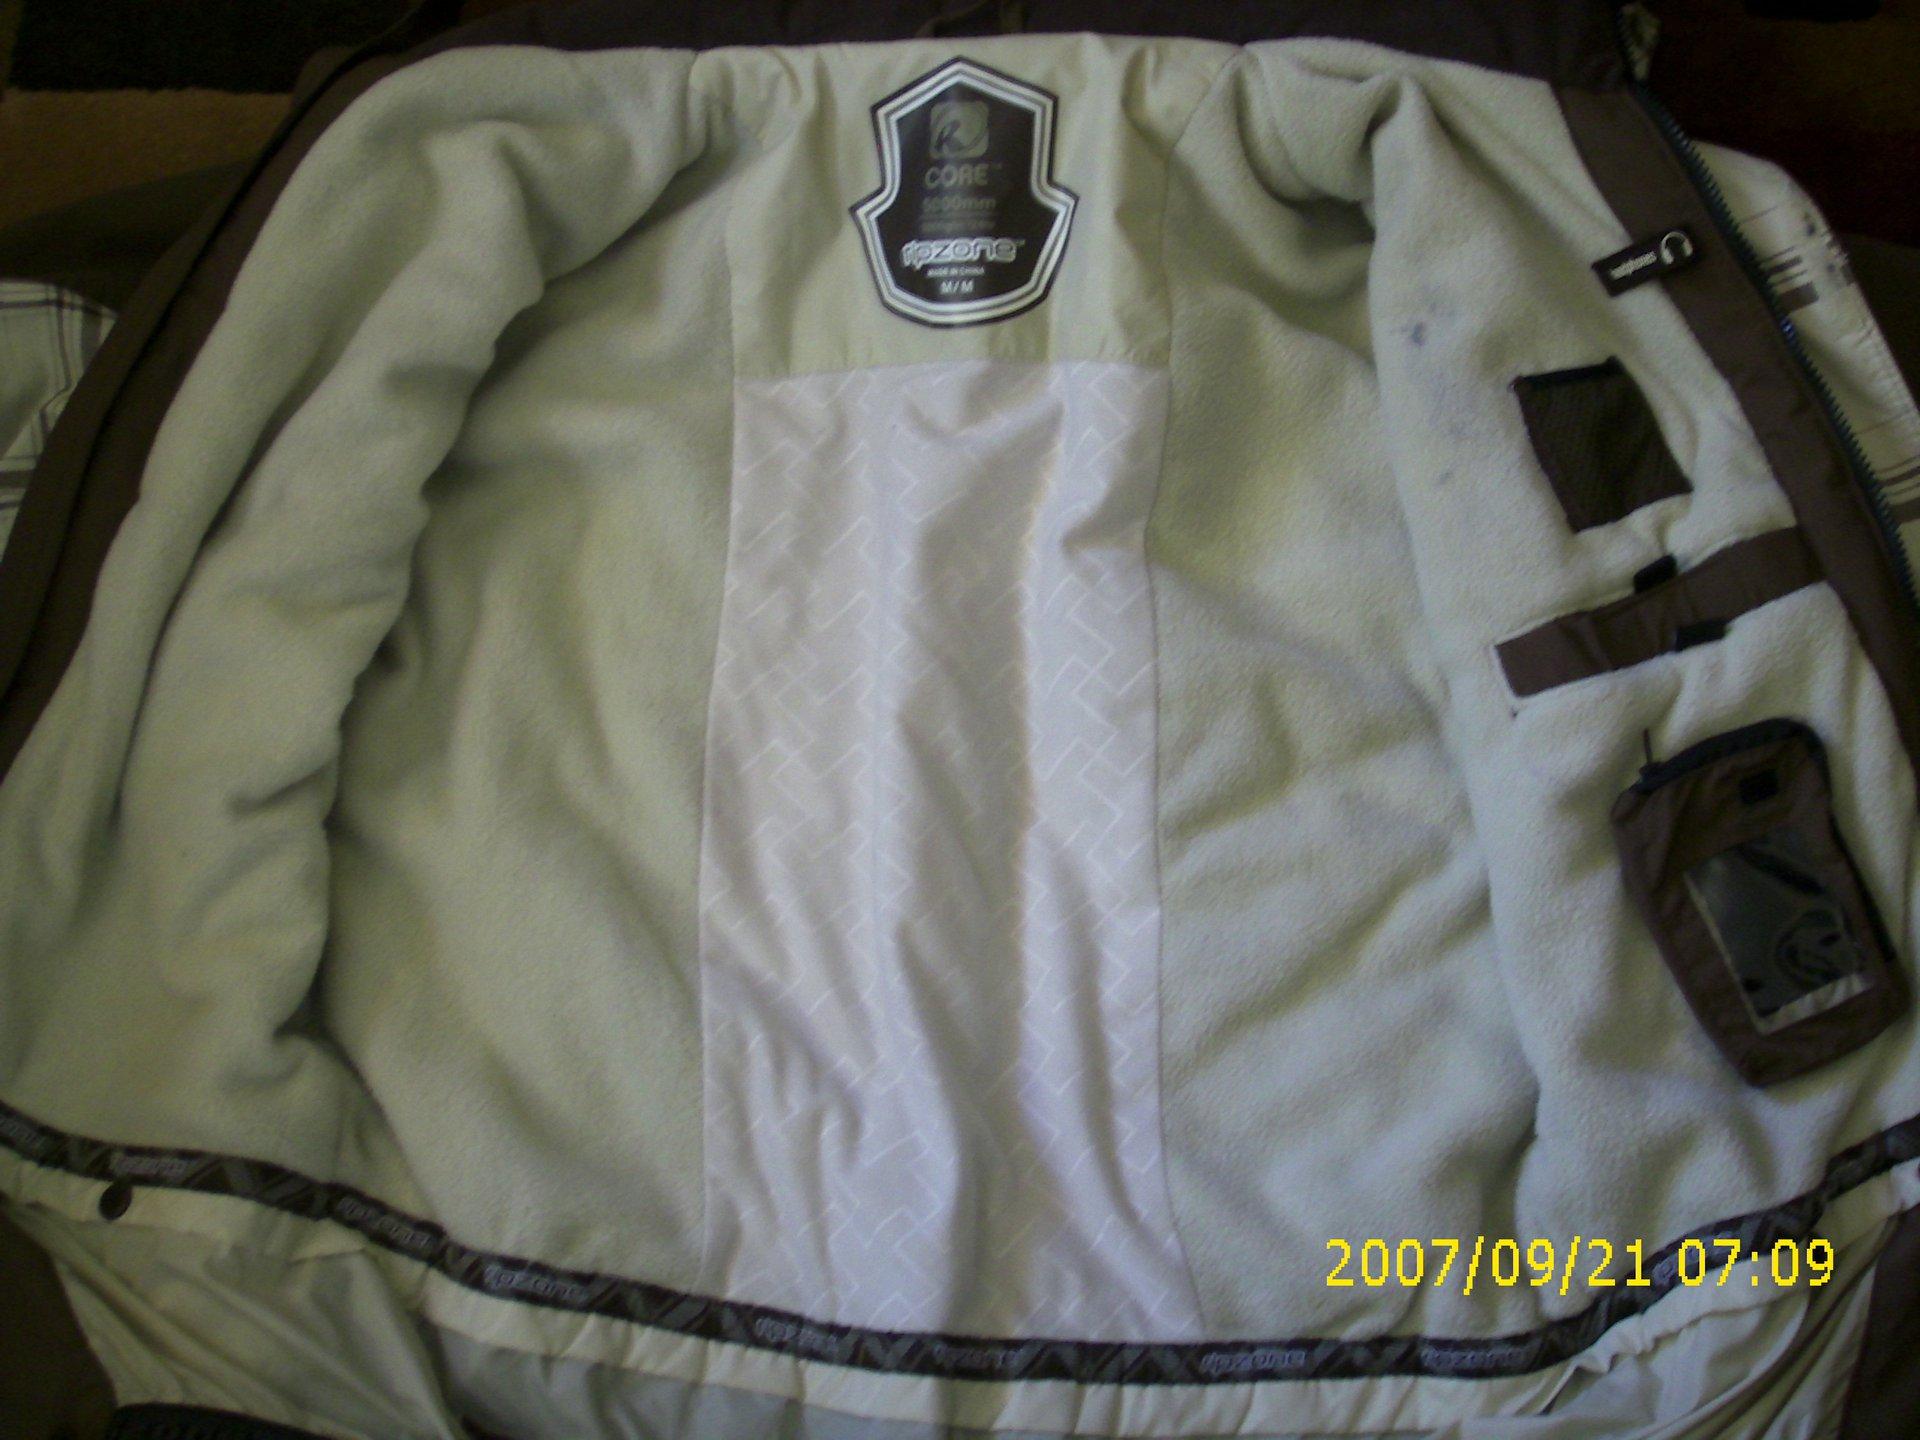 Inside of ripzone jacket